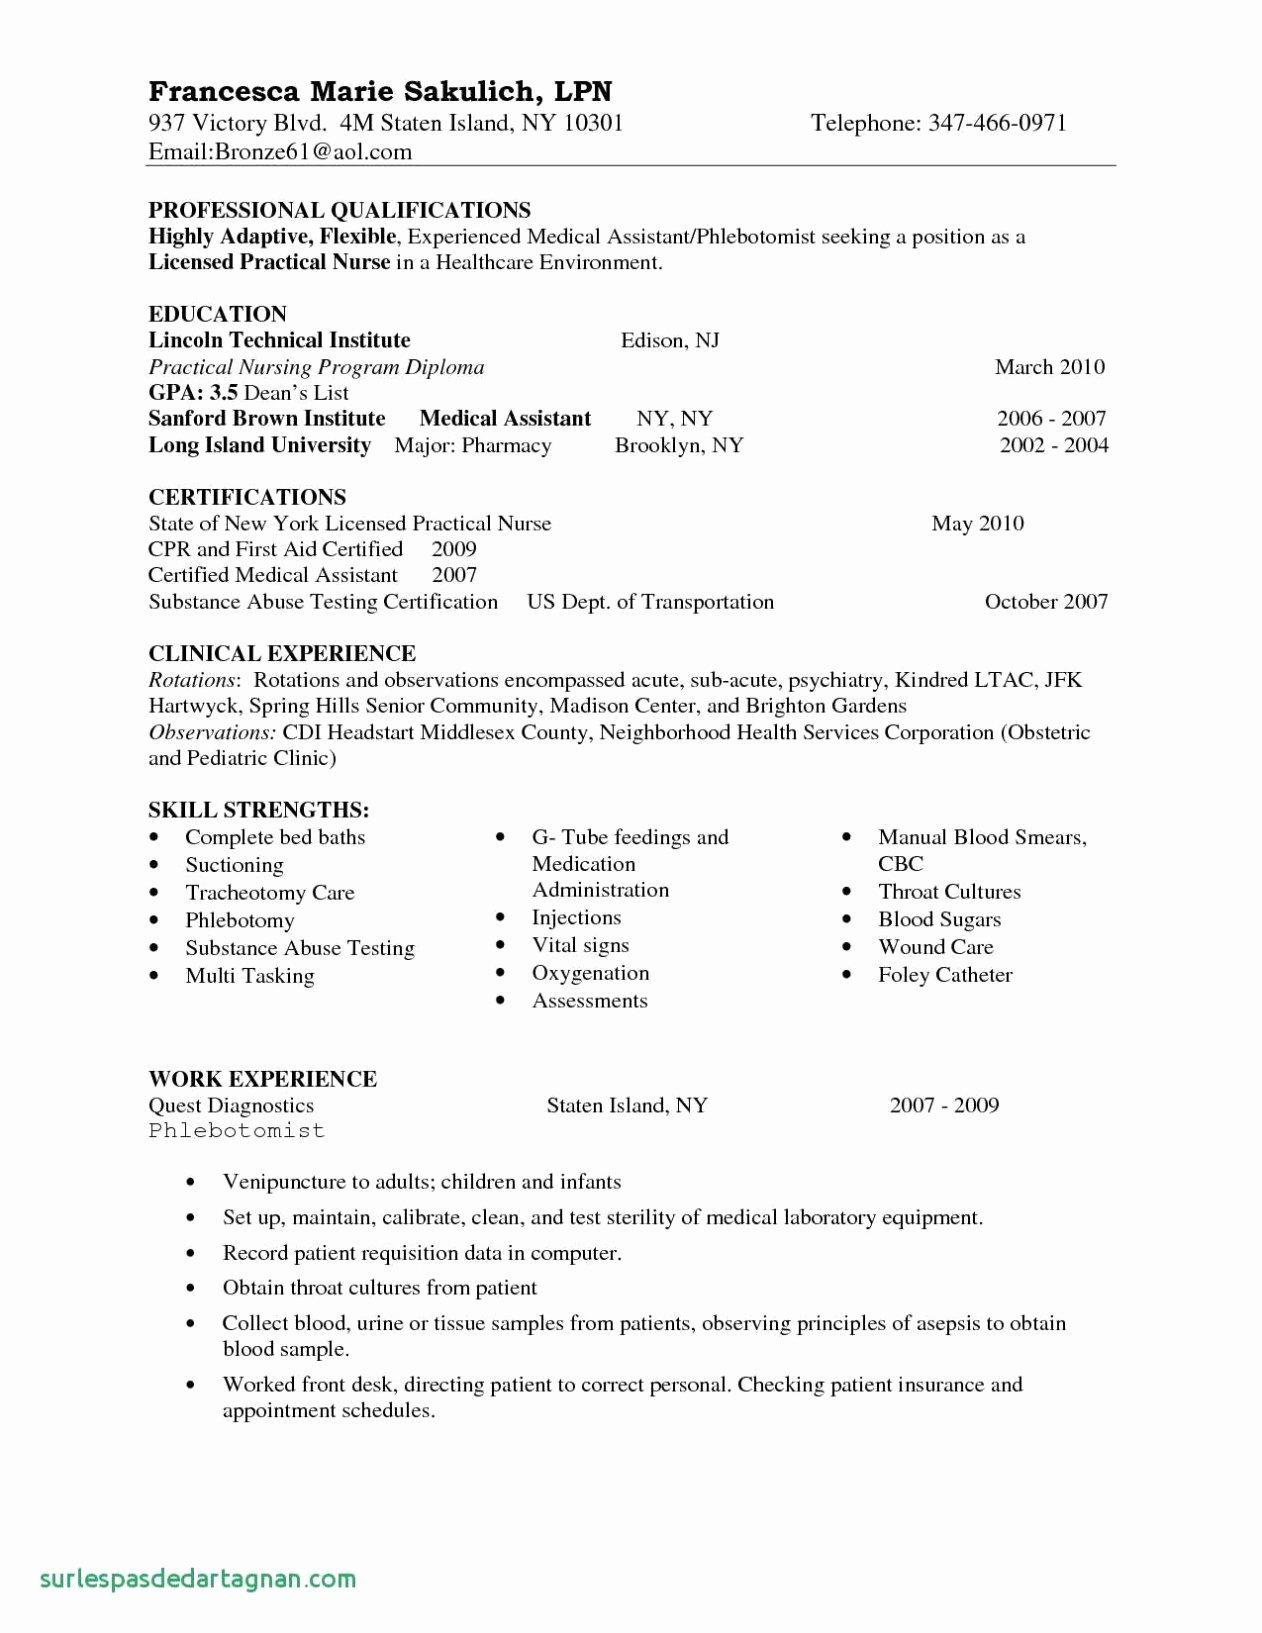 Graduate Nurse Resume Template Free Luxury New Graduate Nurse Resume Tag 45 Extraordinary New